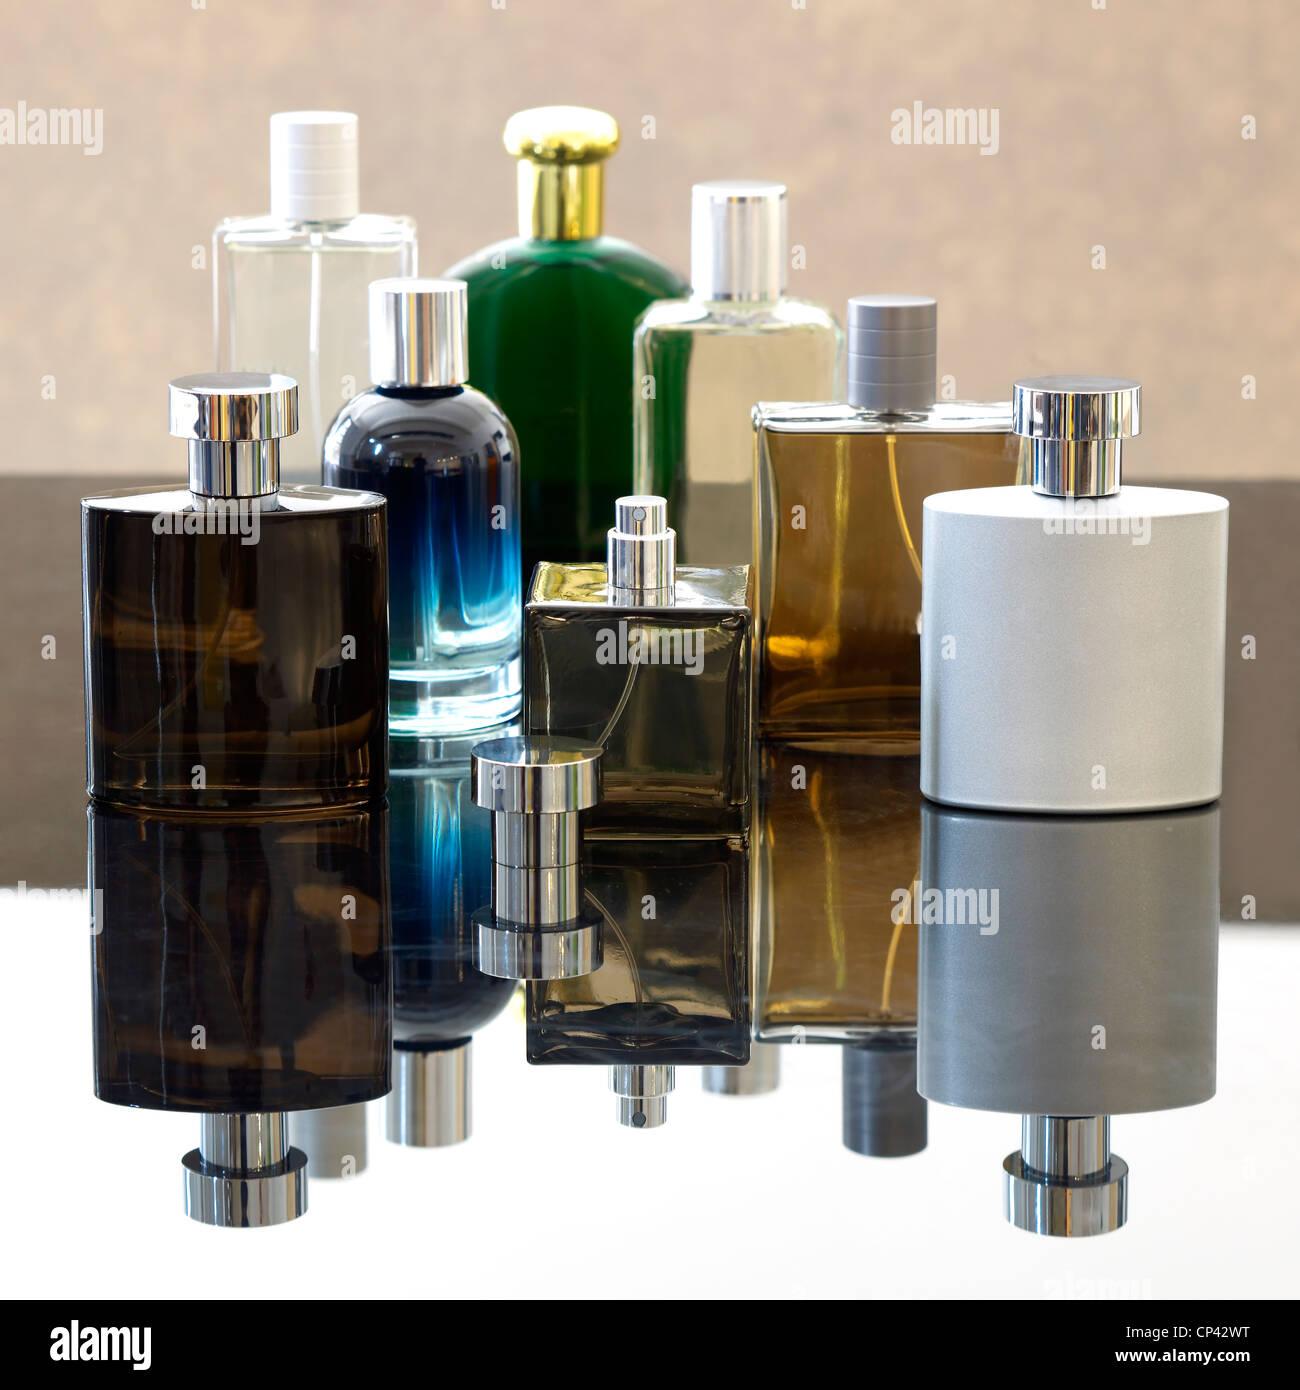 A still life shot of several mens aftershave bottles - Stock Image